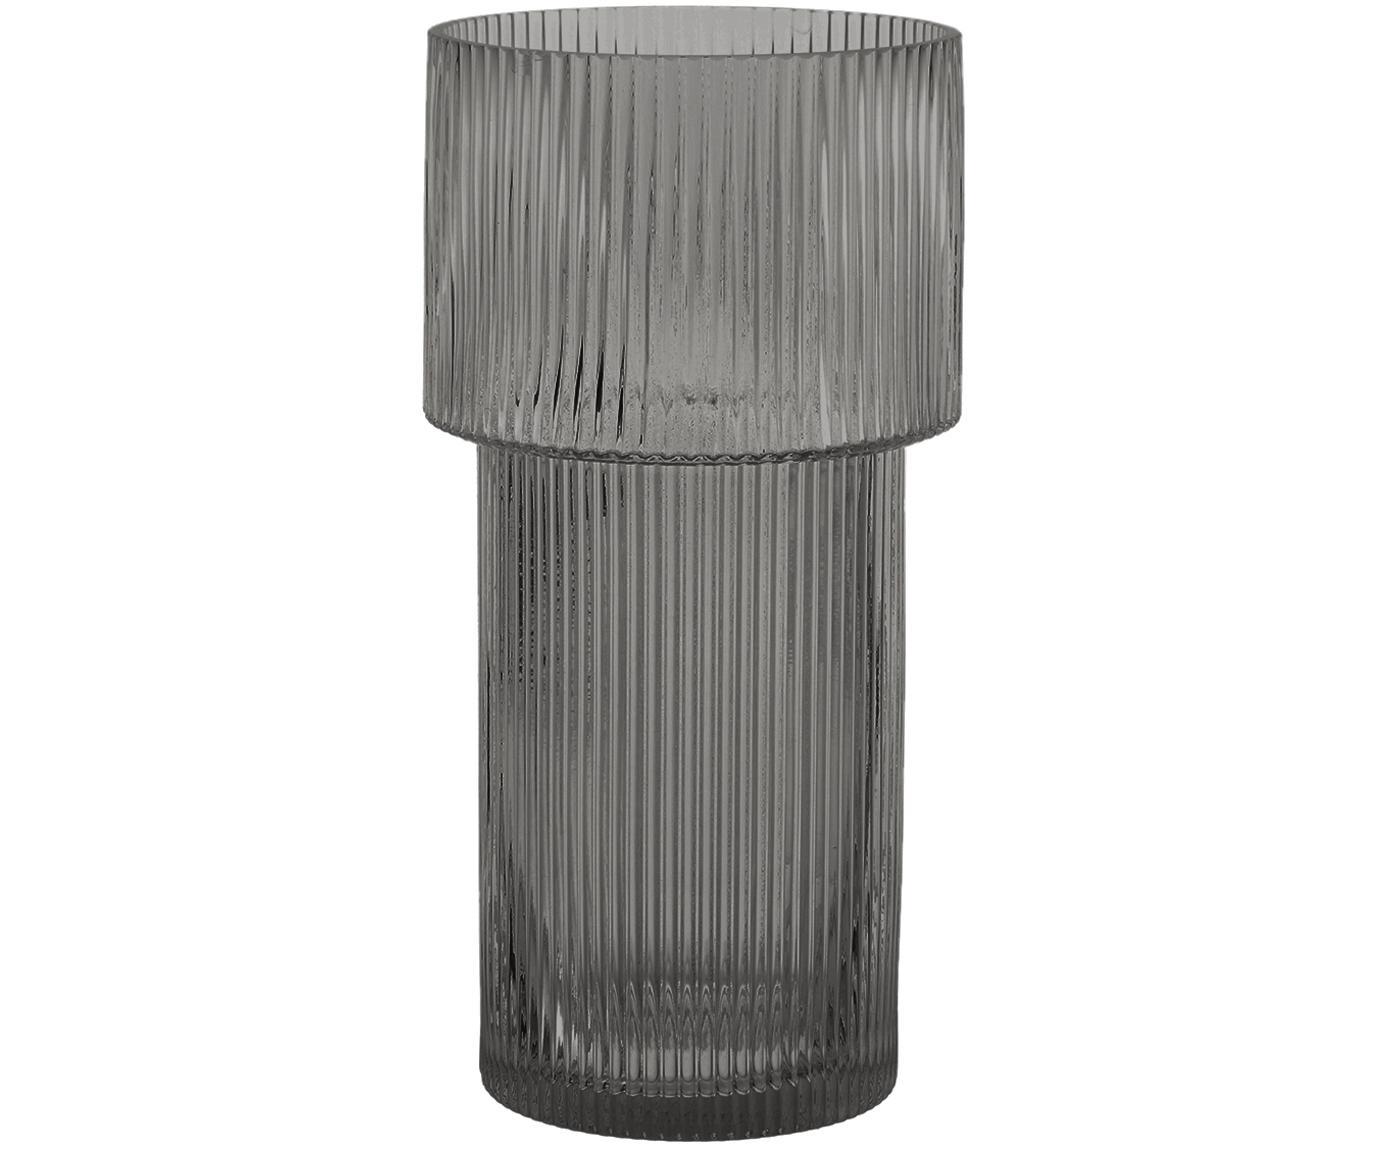 Glas-Vase Lija, Glas, Grau, transparent, ∅ 14 x H 30 cm